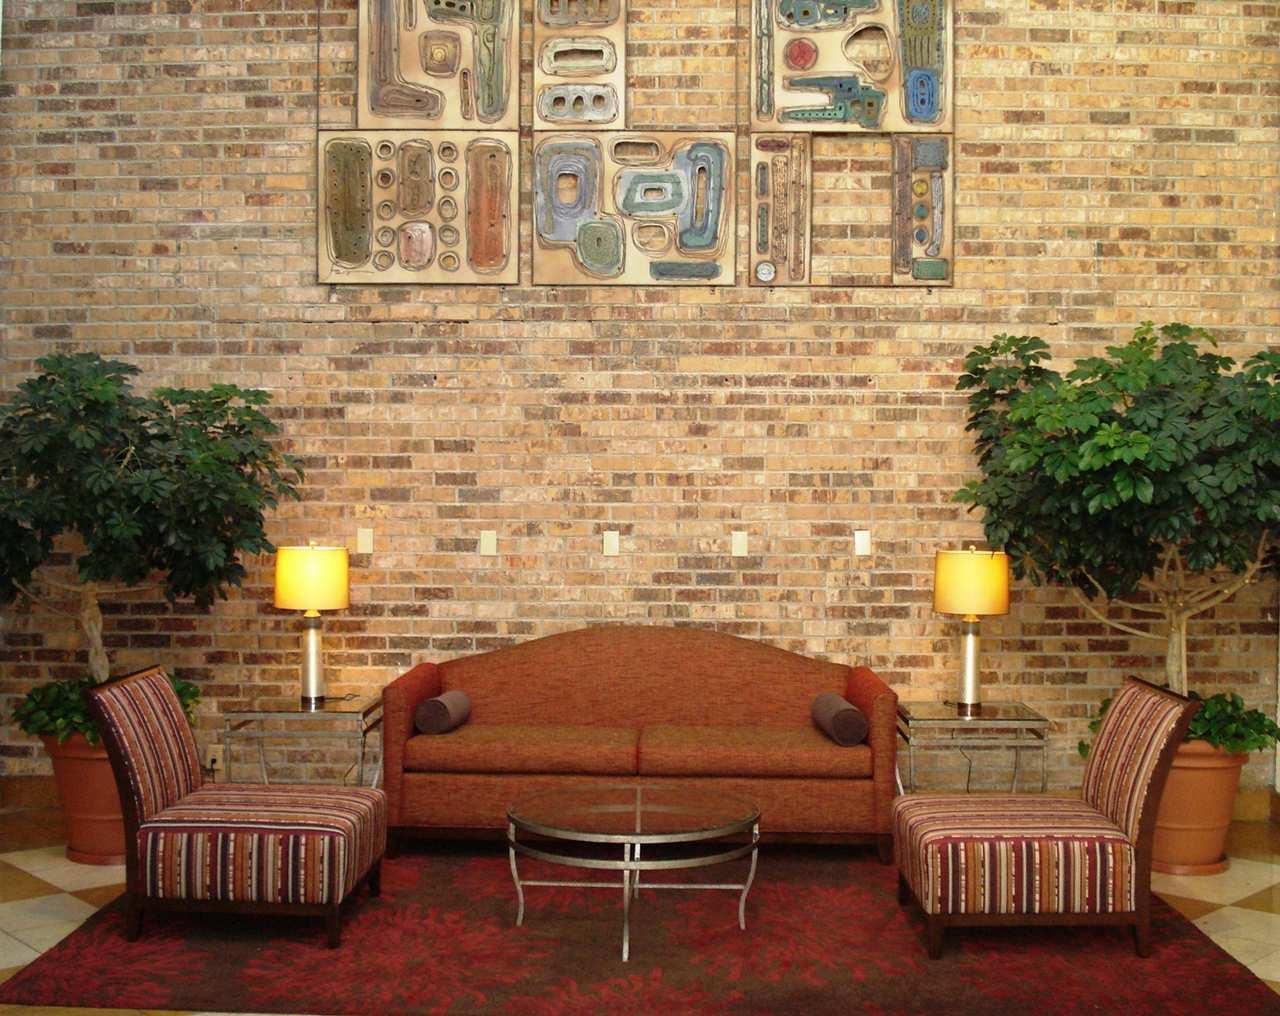 DoubleTree by Hilton Hotel Oak Ridge - Knoxville image 4